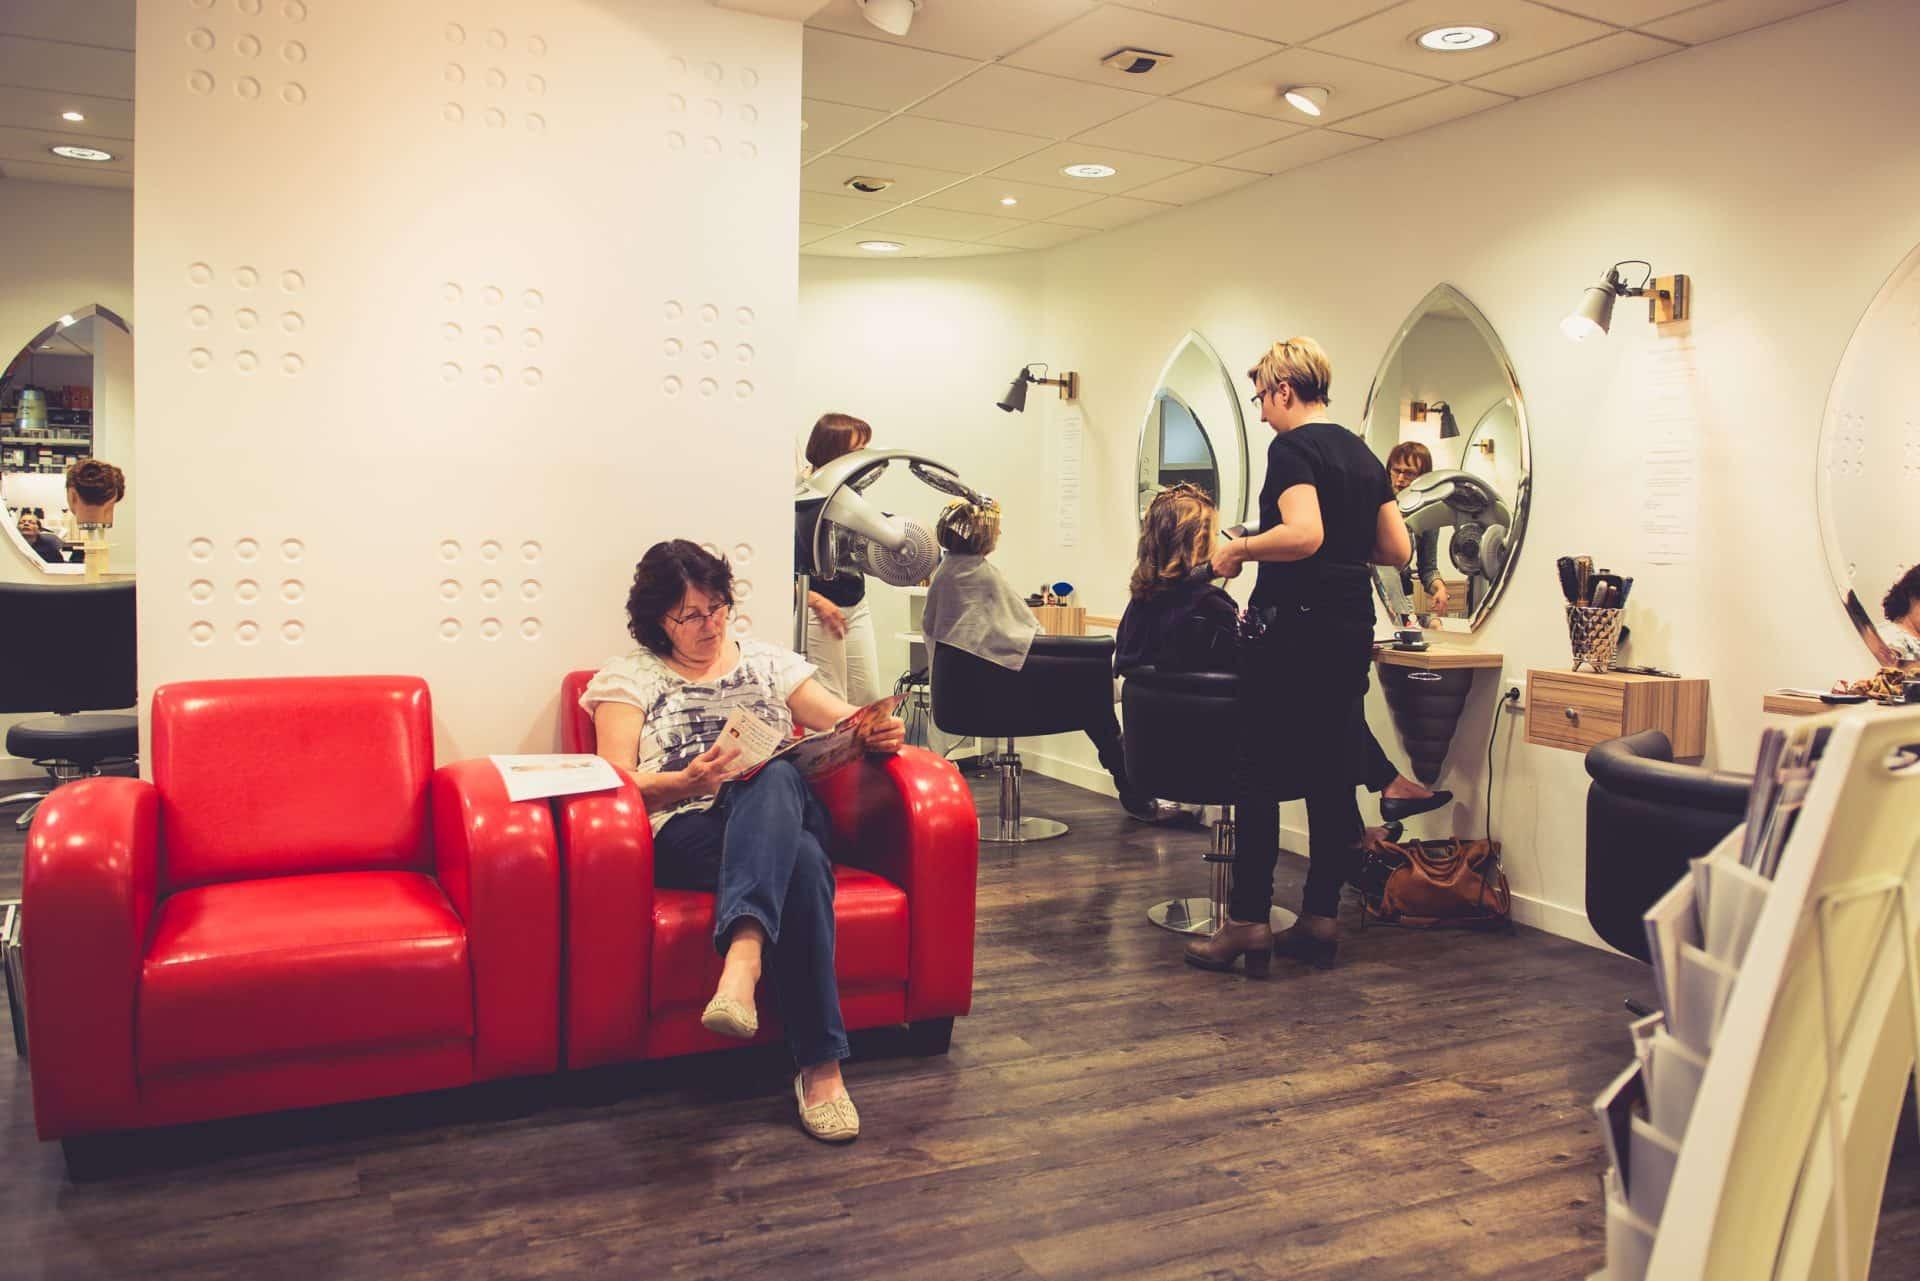 Métamorphose Salon De Coiffure coiffure métamorphose - les vitrines de ploërmel